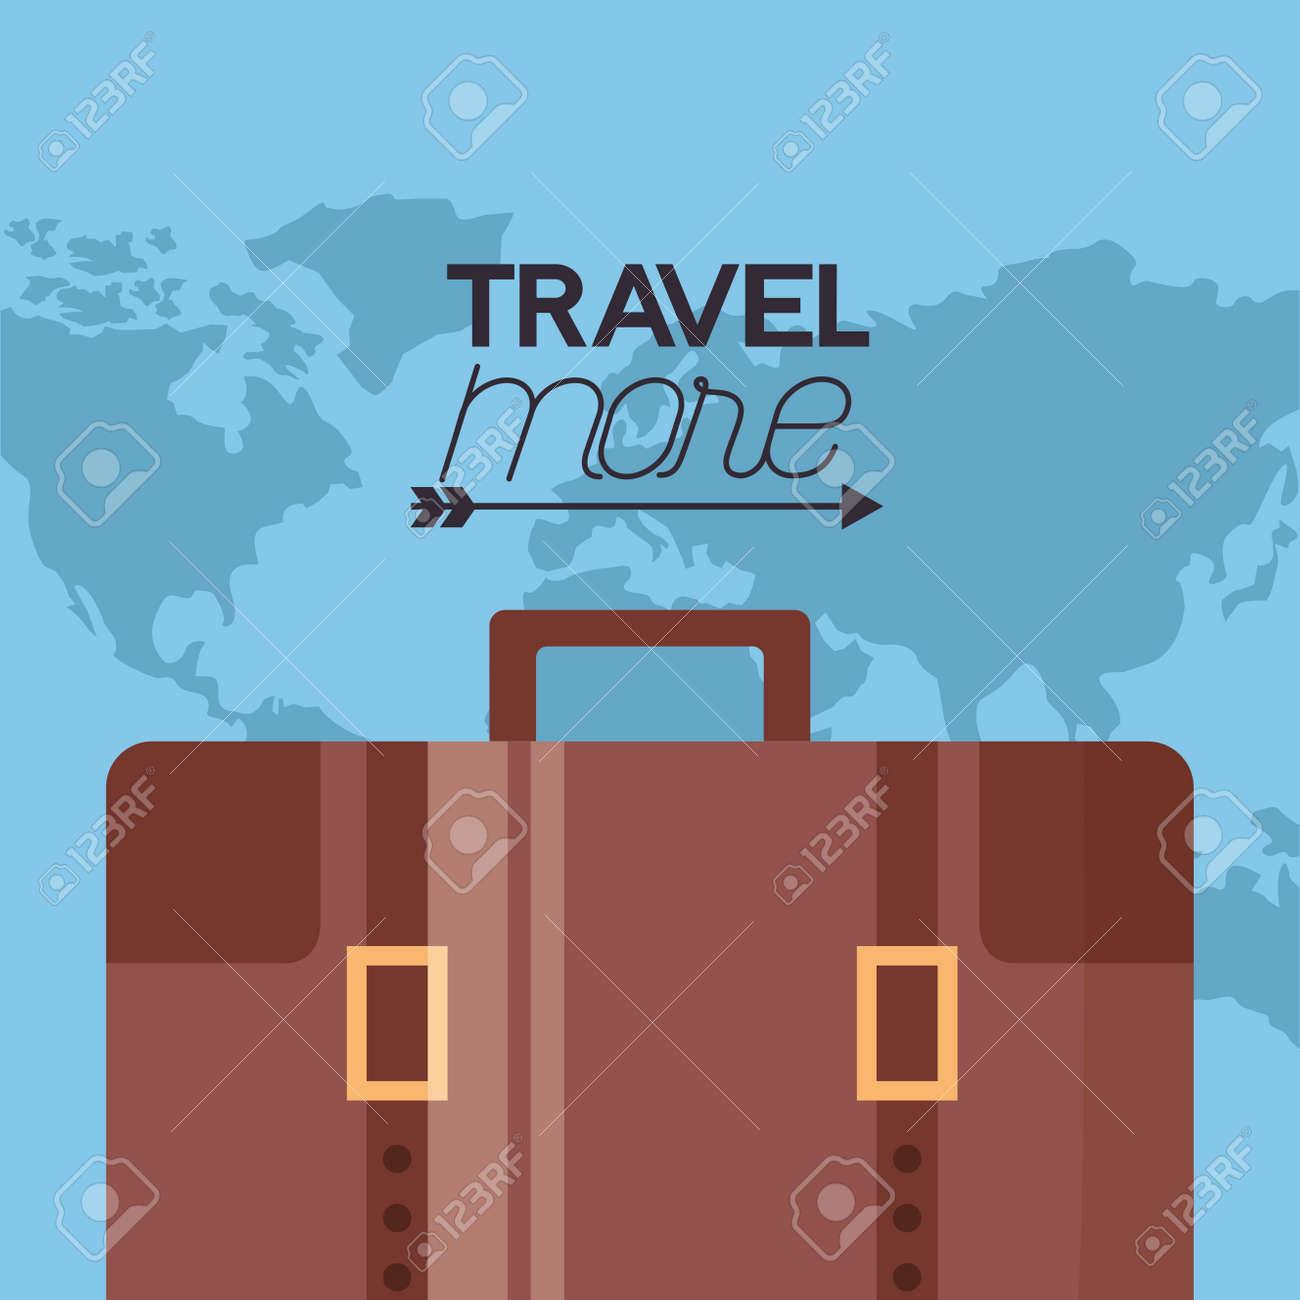 travel more briefcase travel map background vector illustration - 125647512